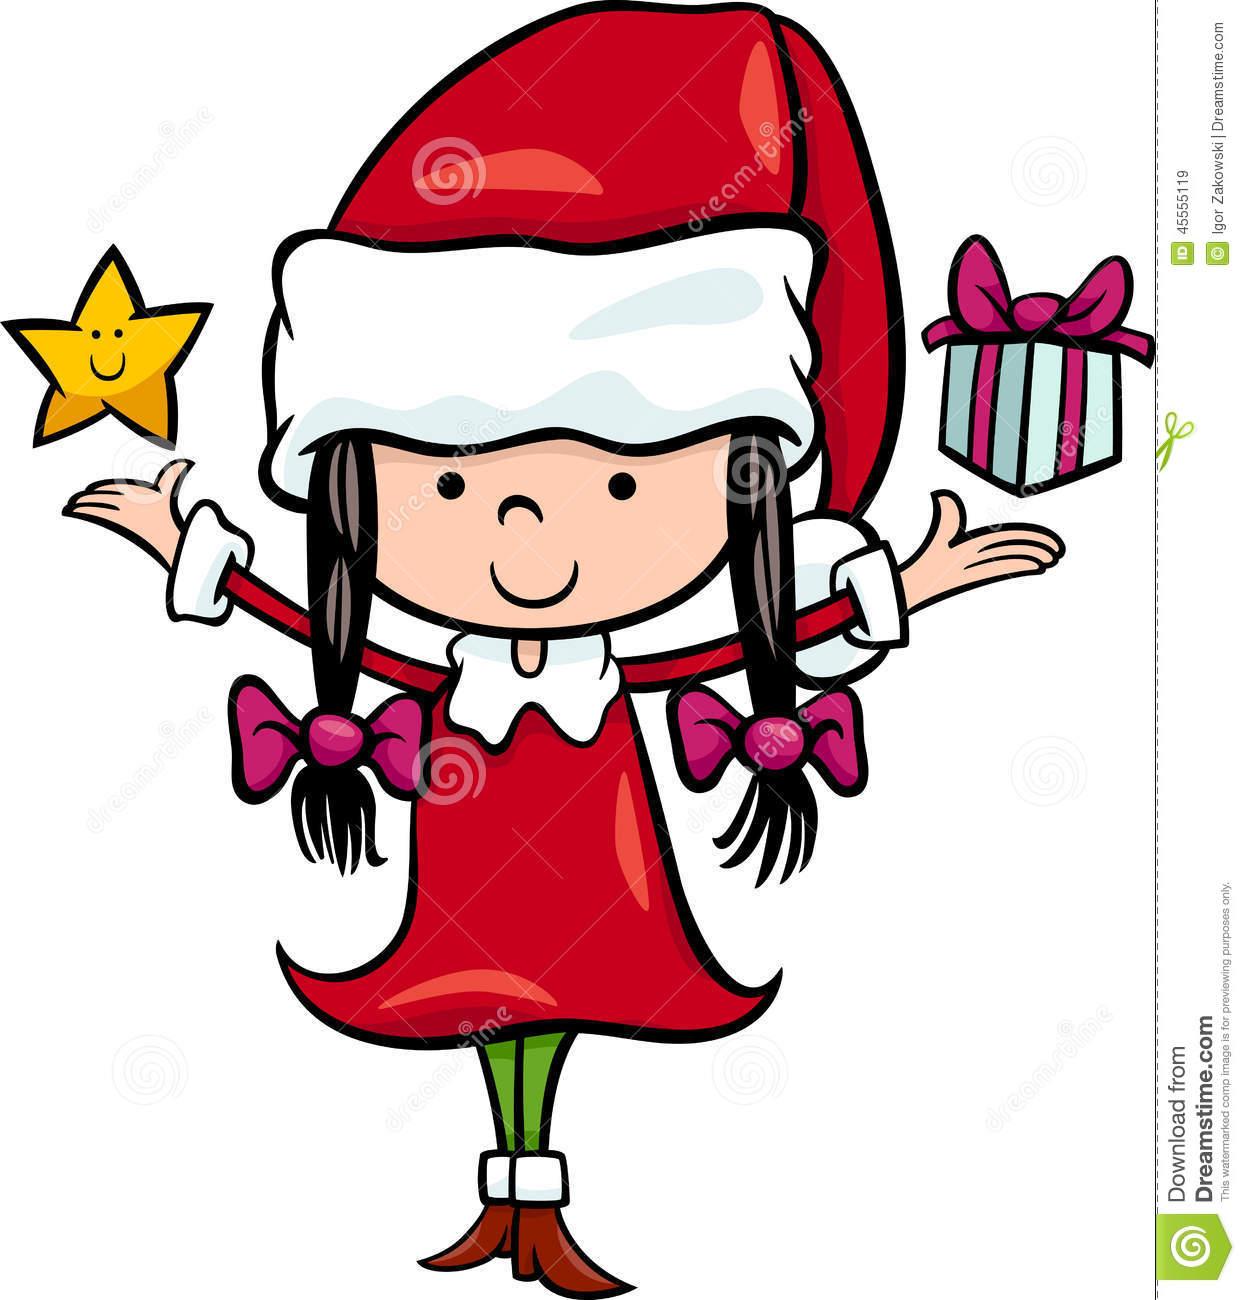 Santa Claus Girl Cartoon Illustration Stock Vector.